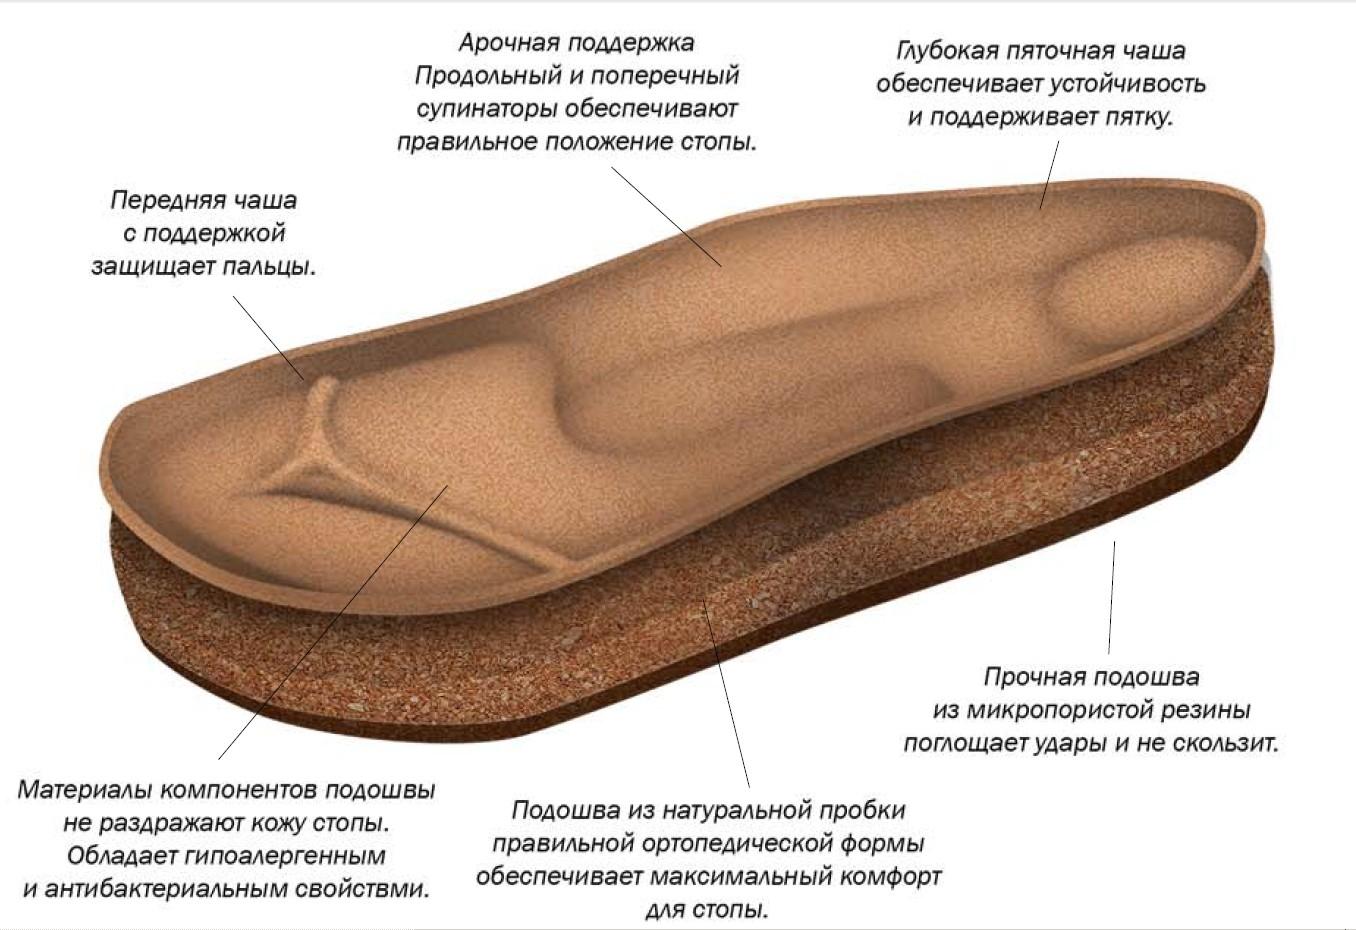 Orthopedic Sandals 07-005 size 21-30 - 2